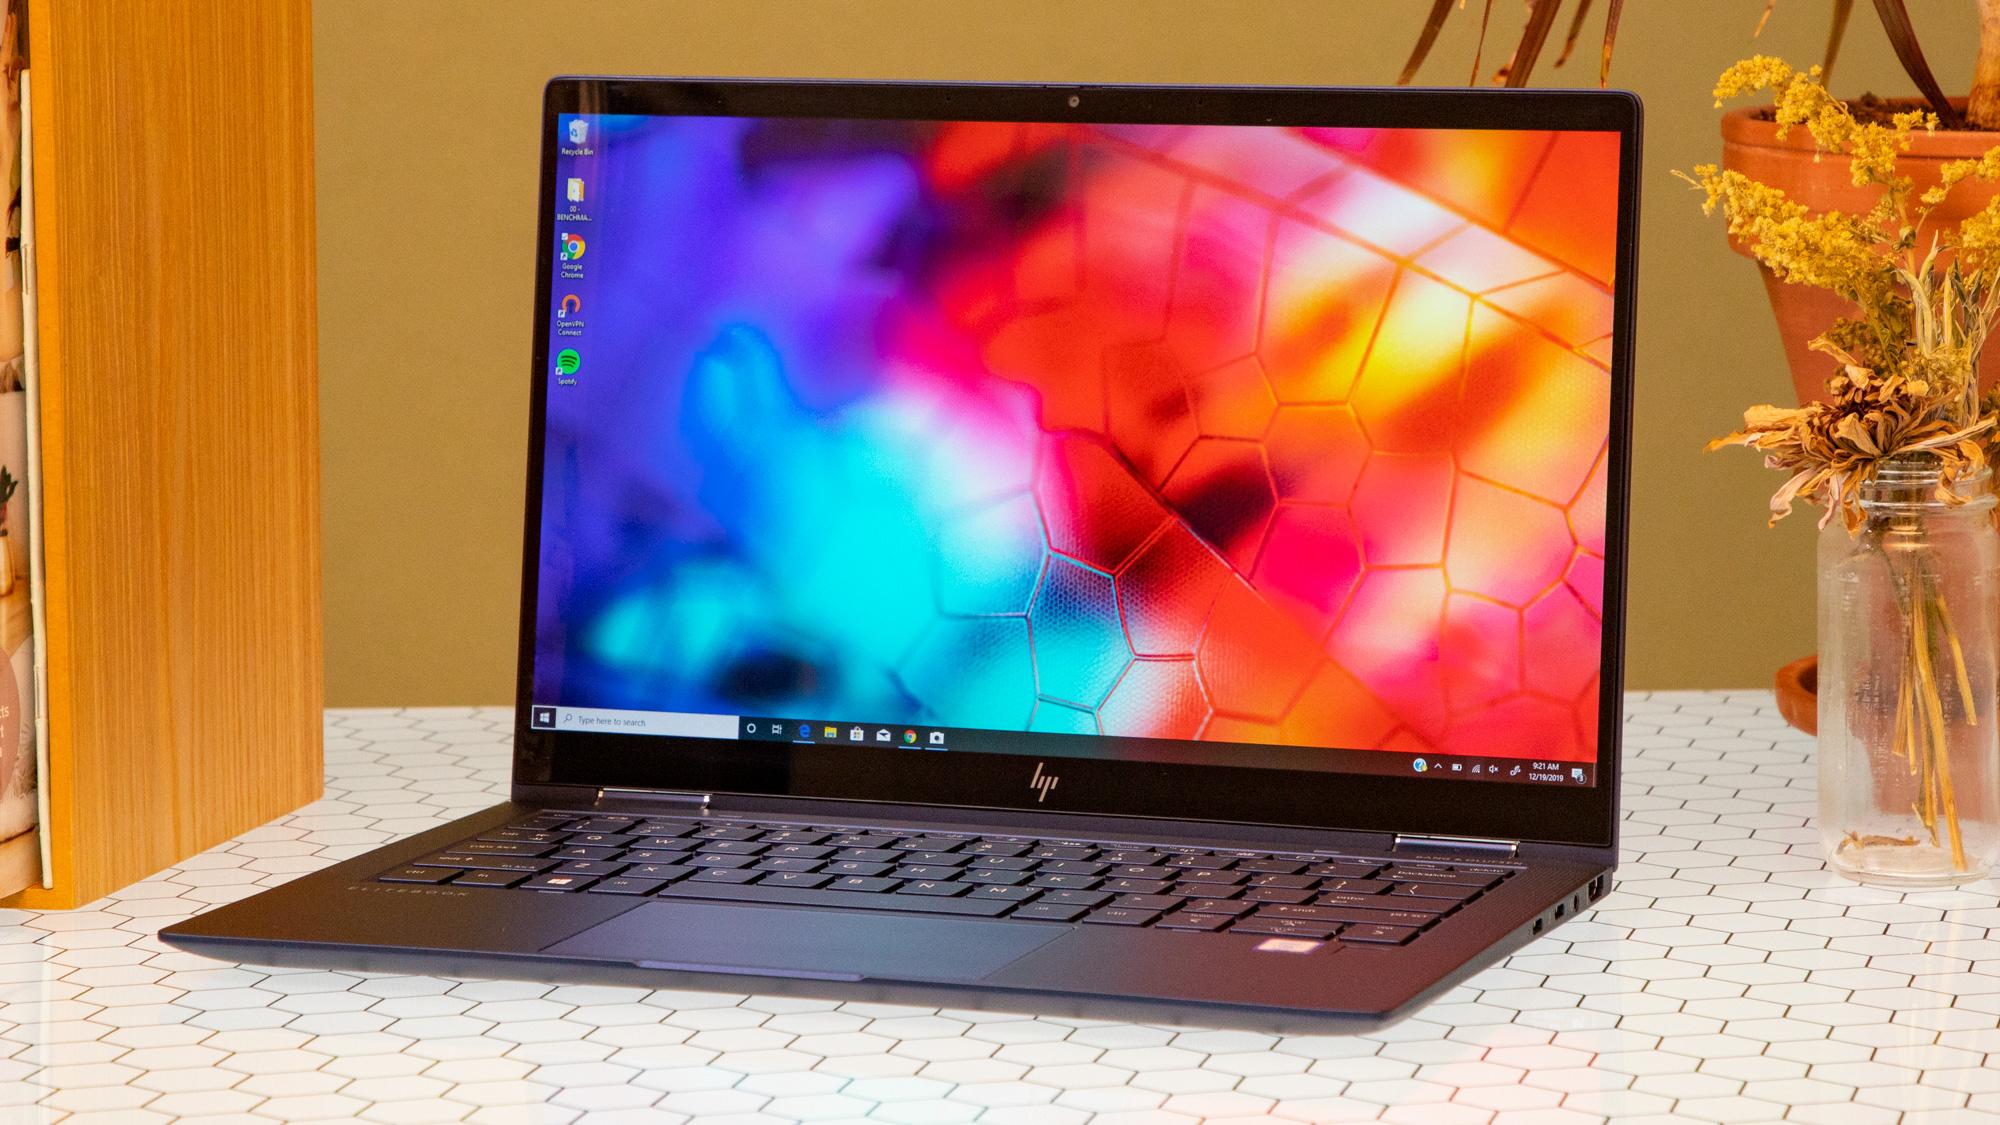 Best touchscreen laptops: HP Elite Dragonfly